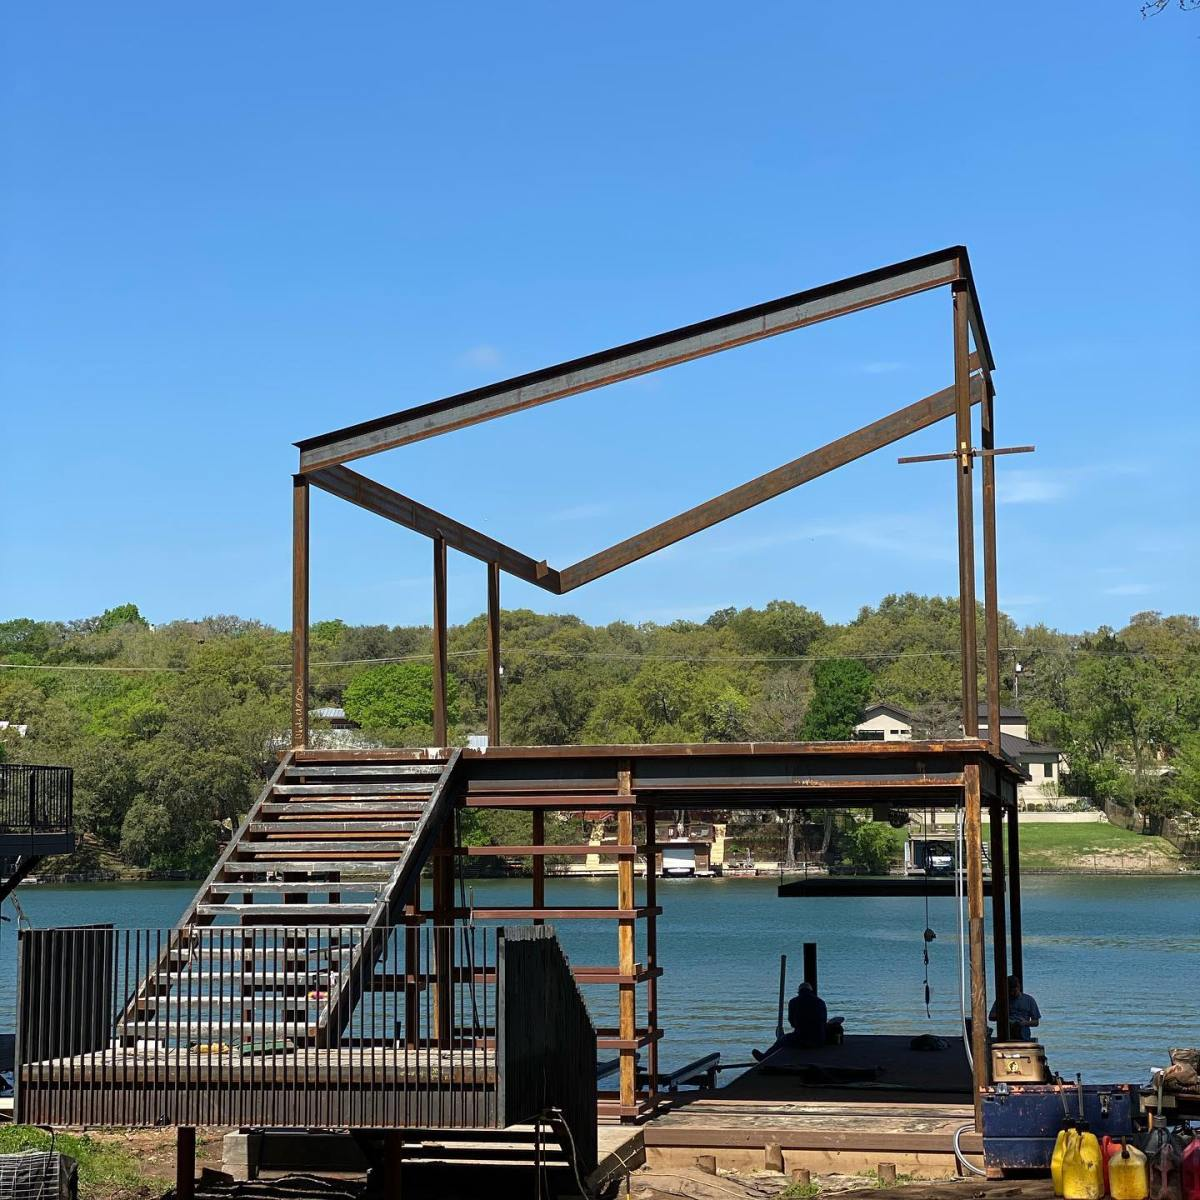 Work stoppage on Lake Austin. Designed by @breckstudio